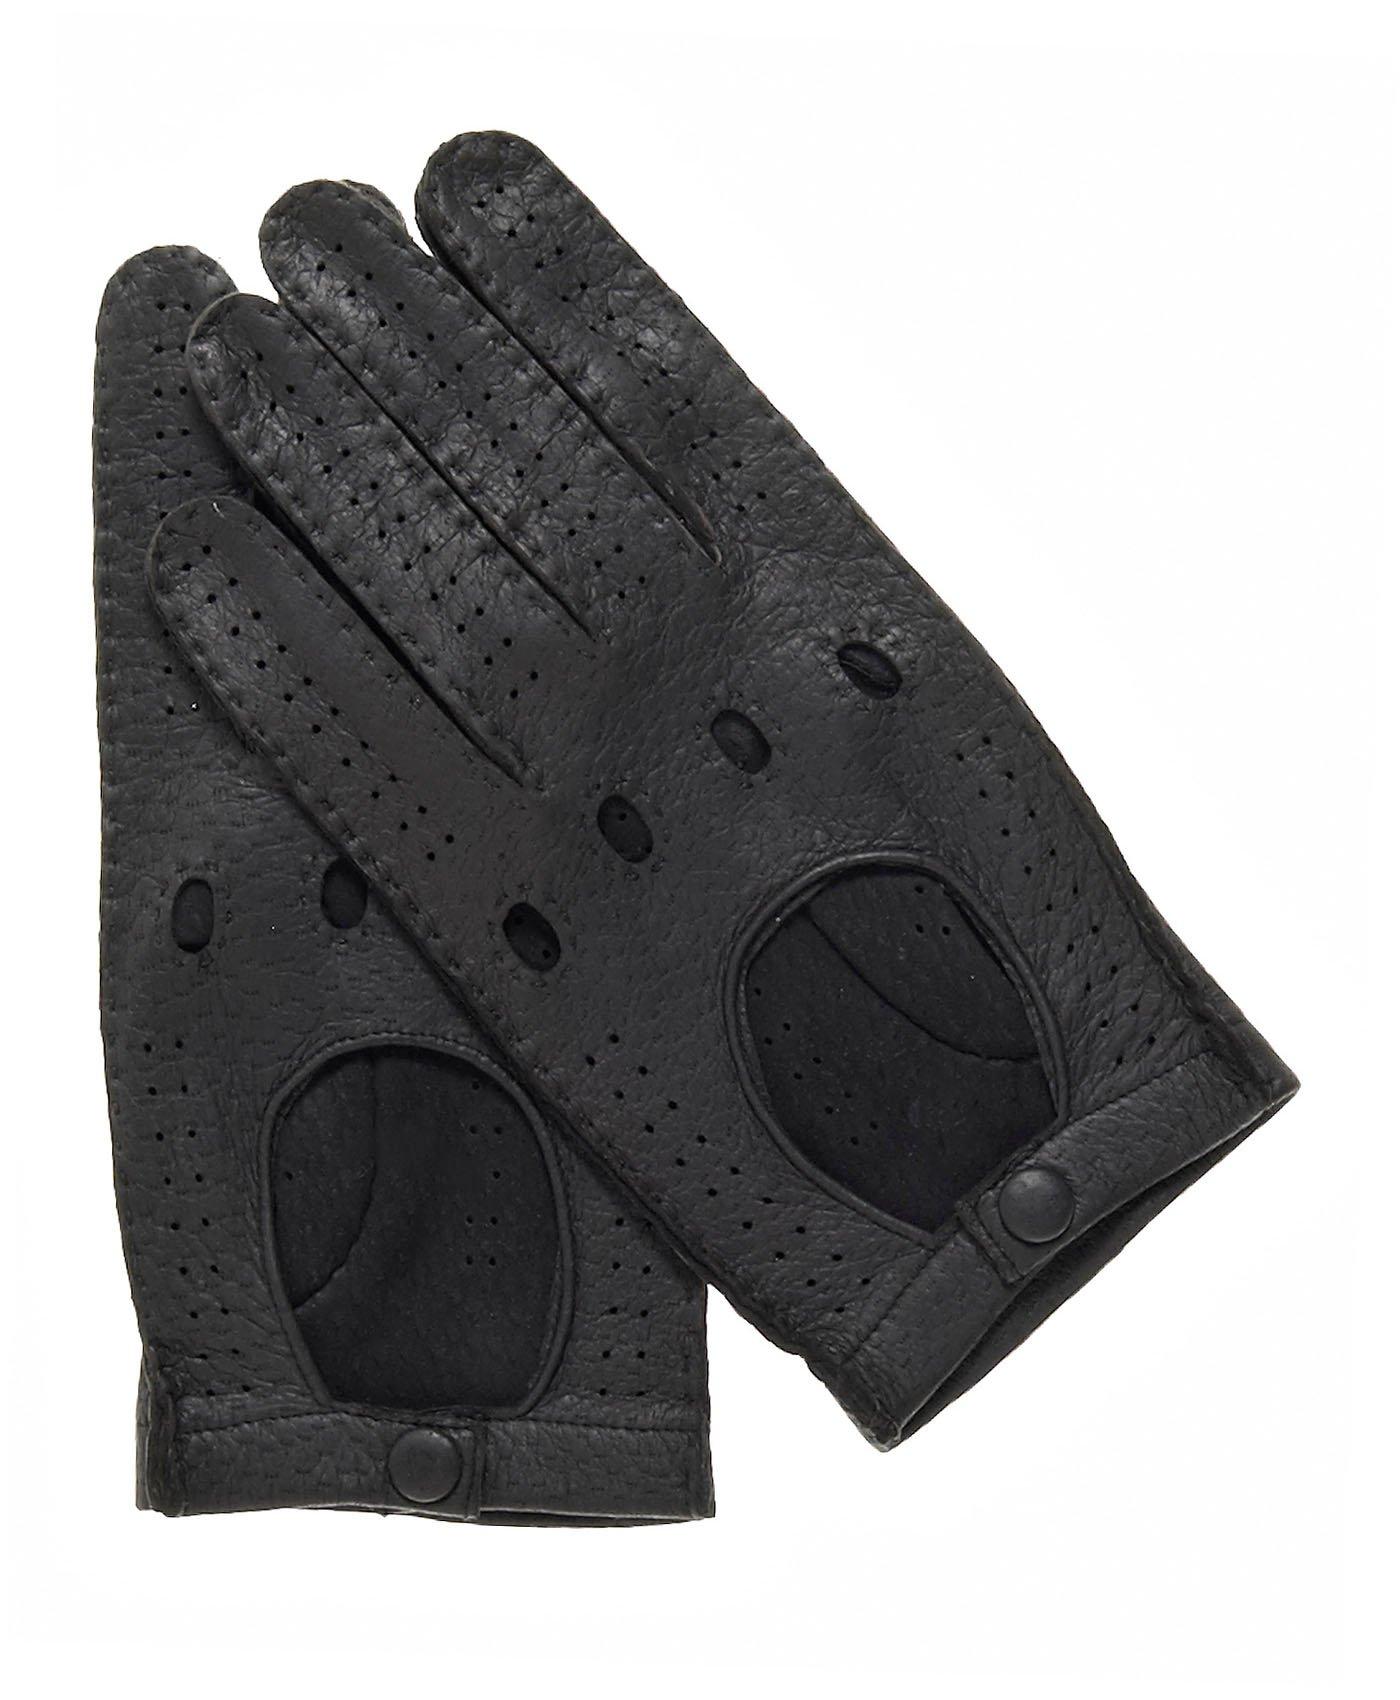 Fratelli Orsini Men's Handsewn Italian Peccary Driving Gloves Size 9 Color Black